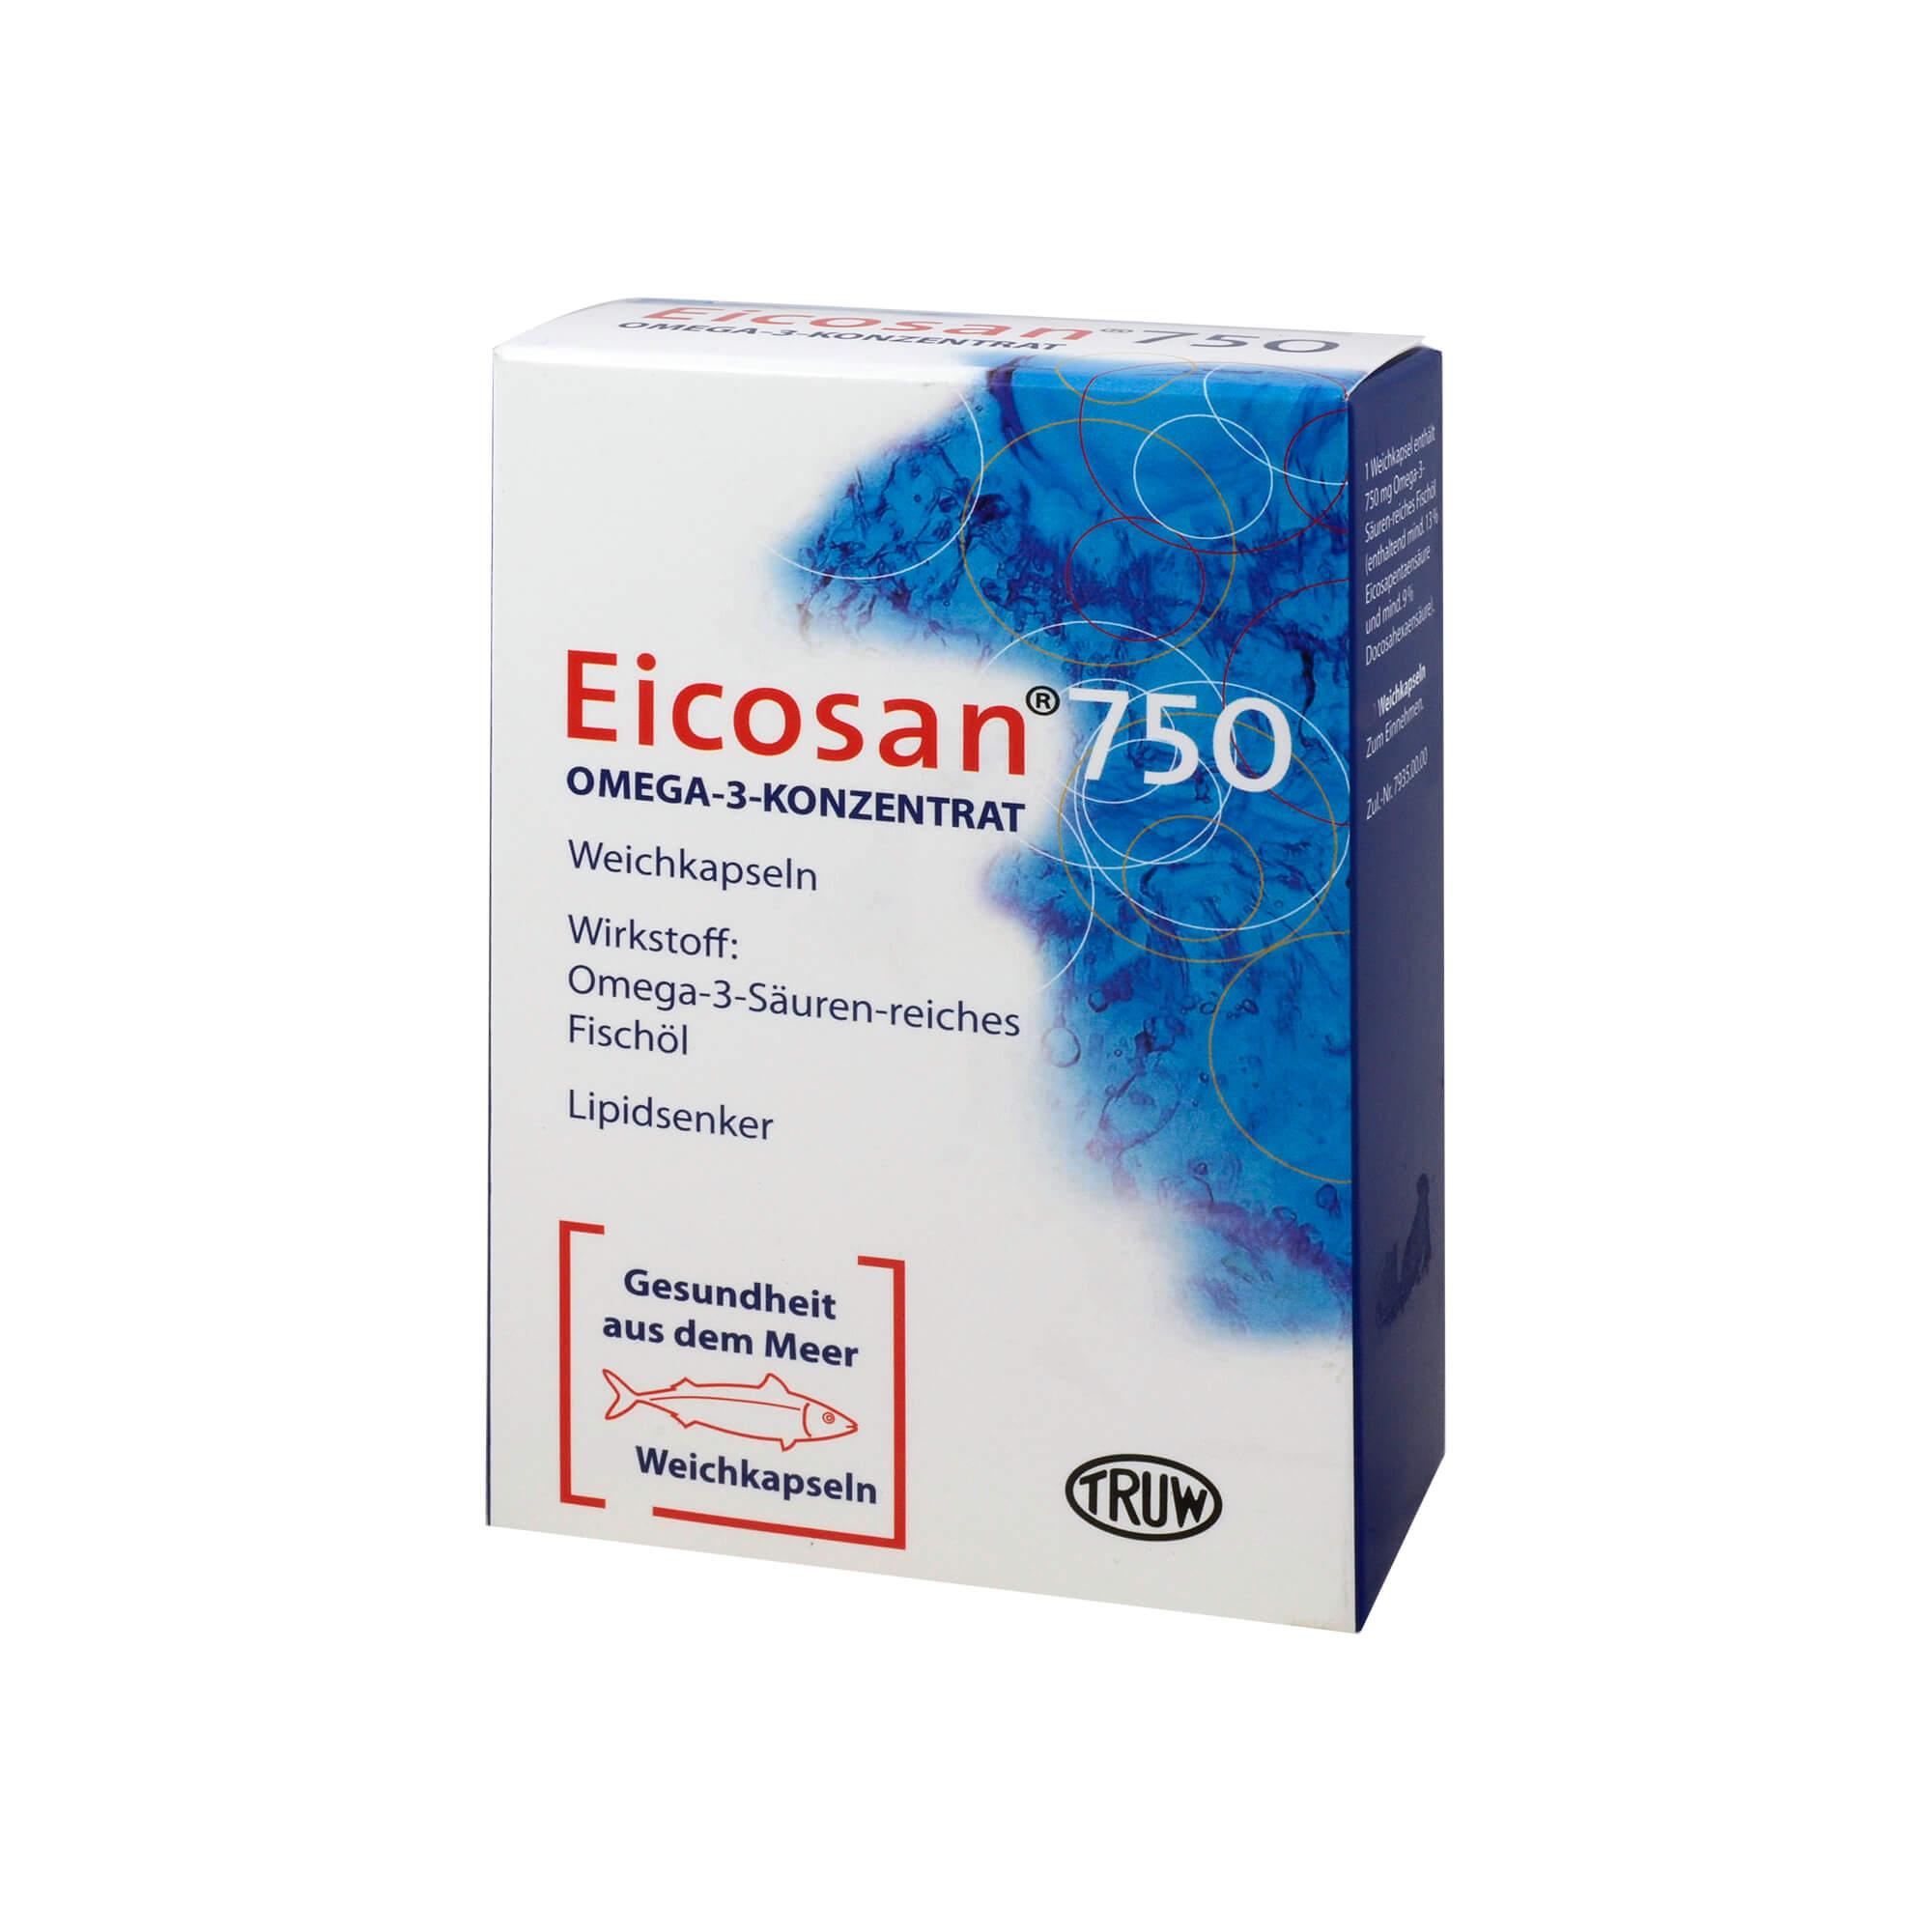 EICOSAN 750 OMEGA-3-KONZ.